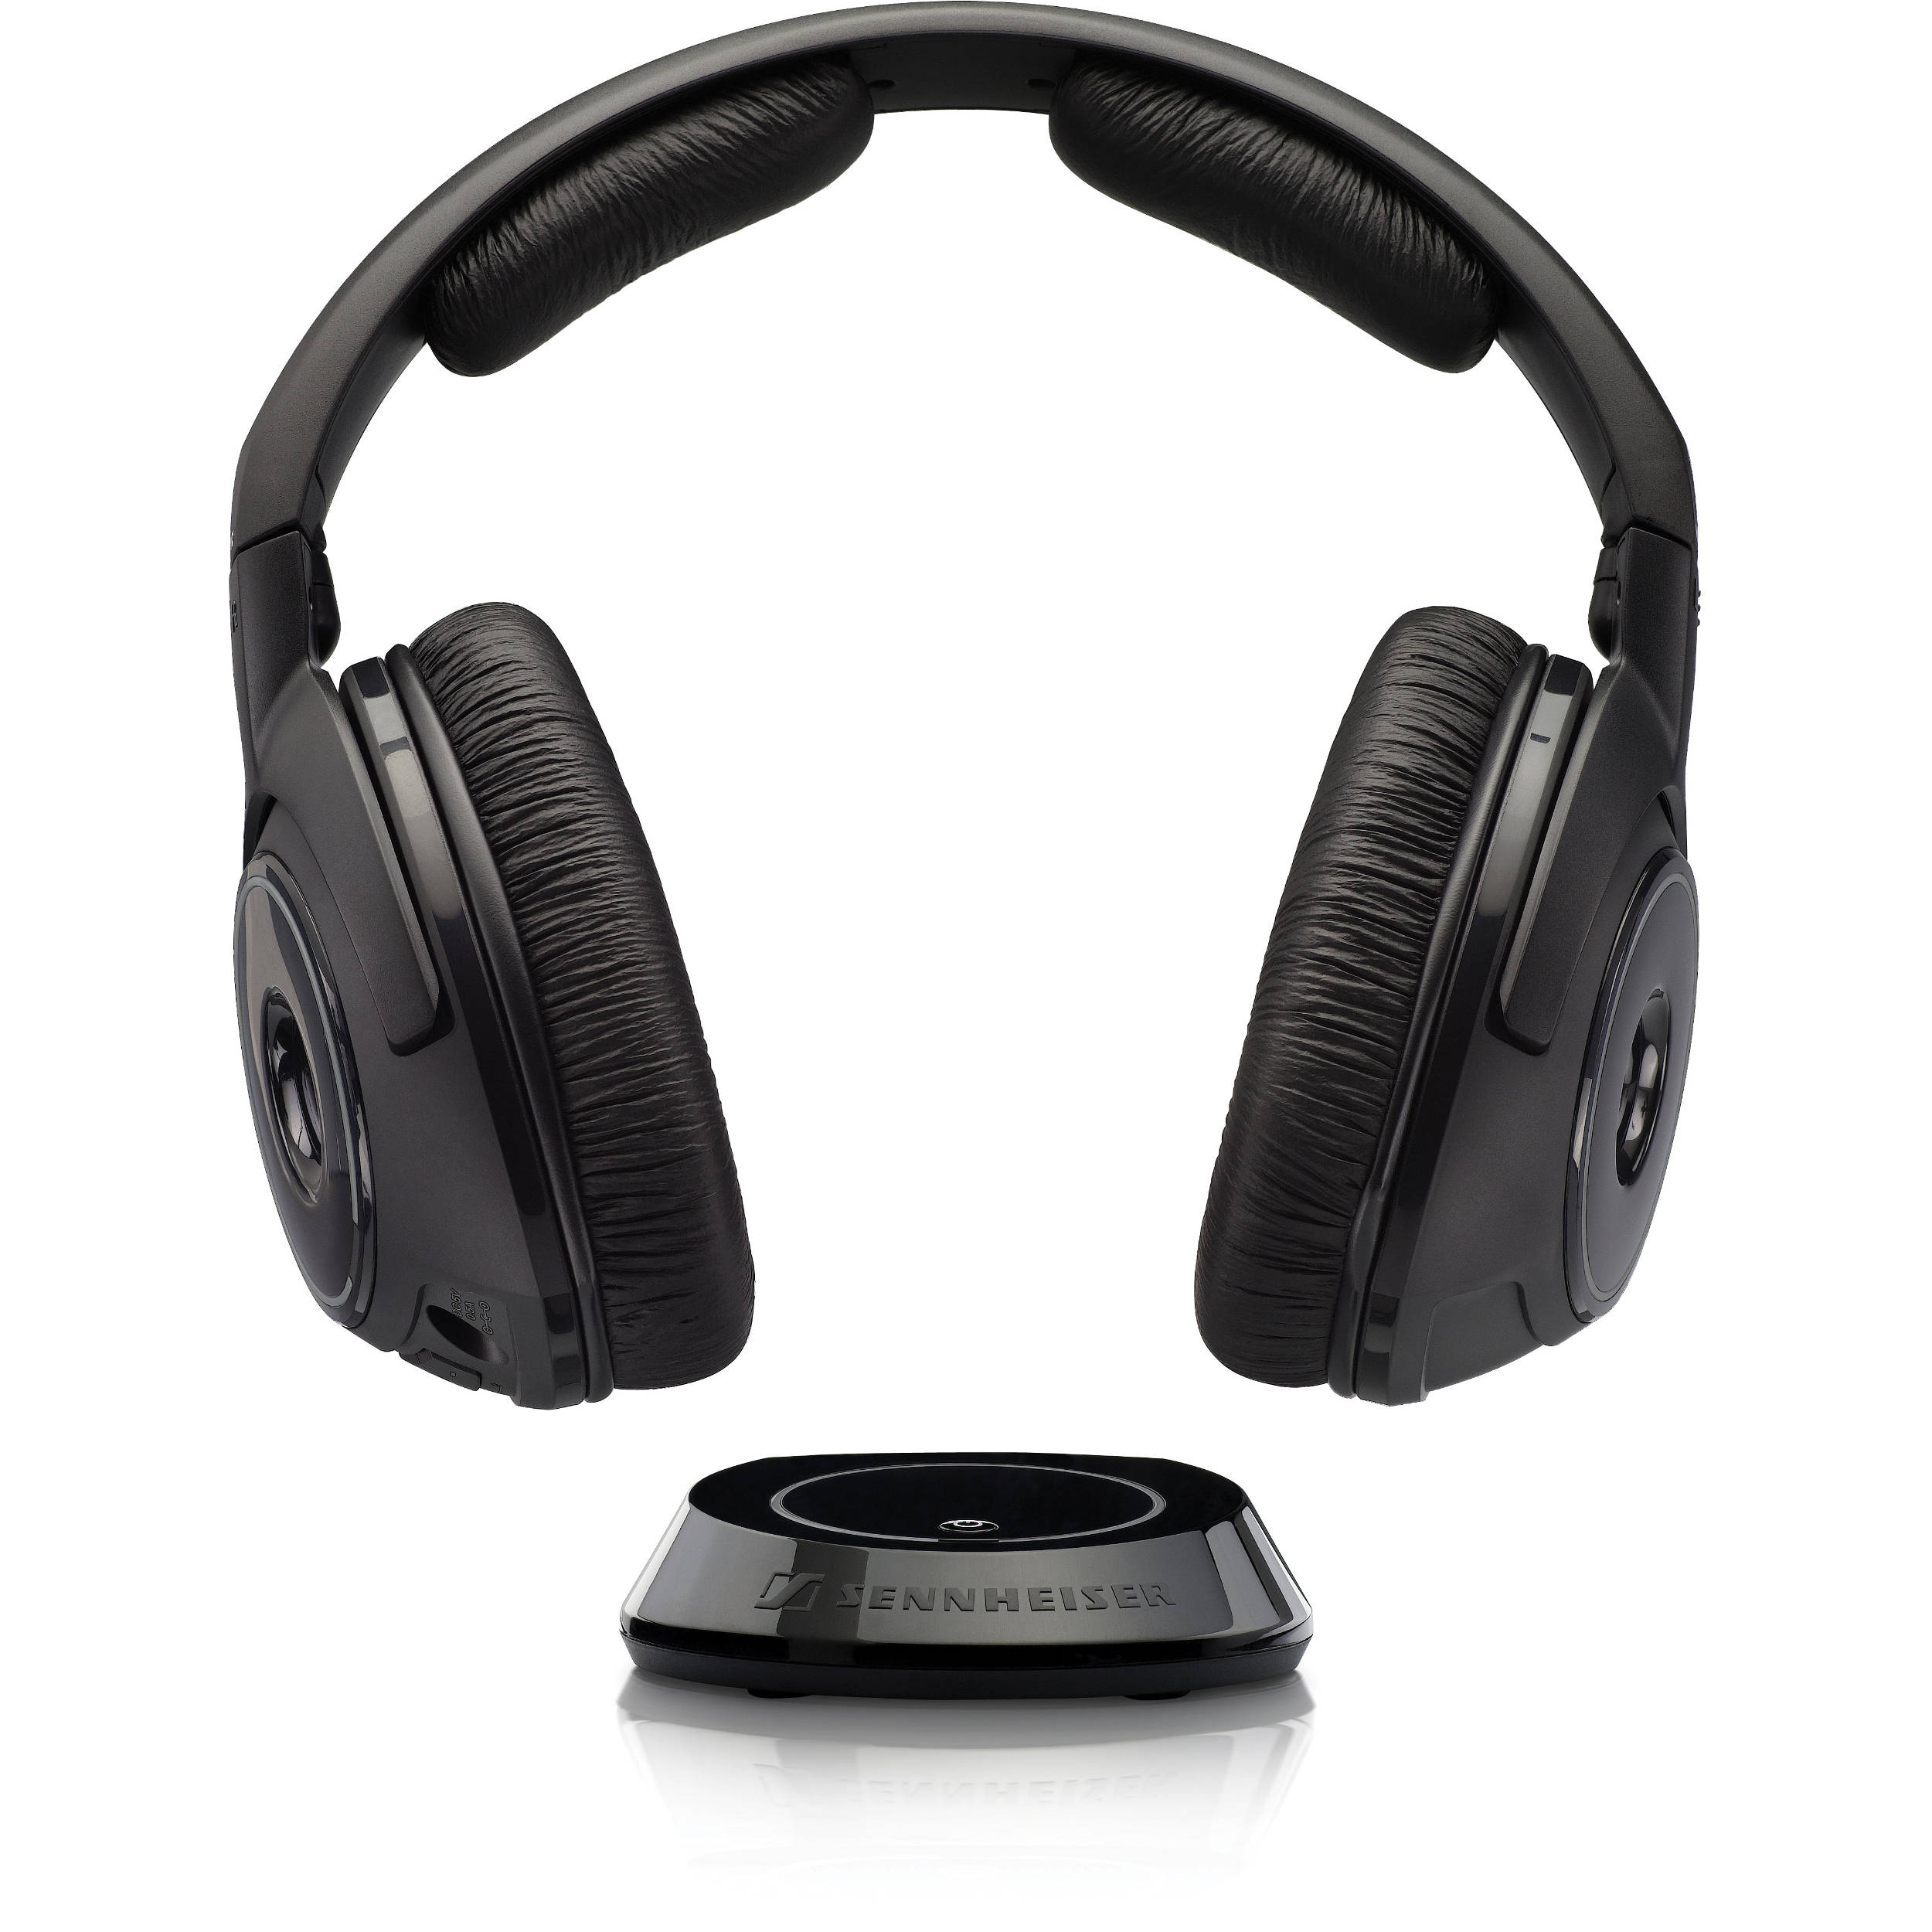 sennheiser headphones wireless manual